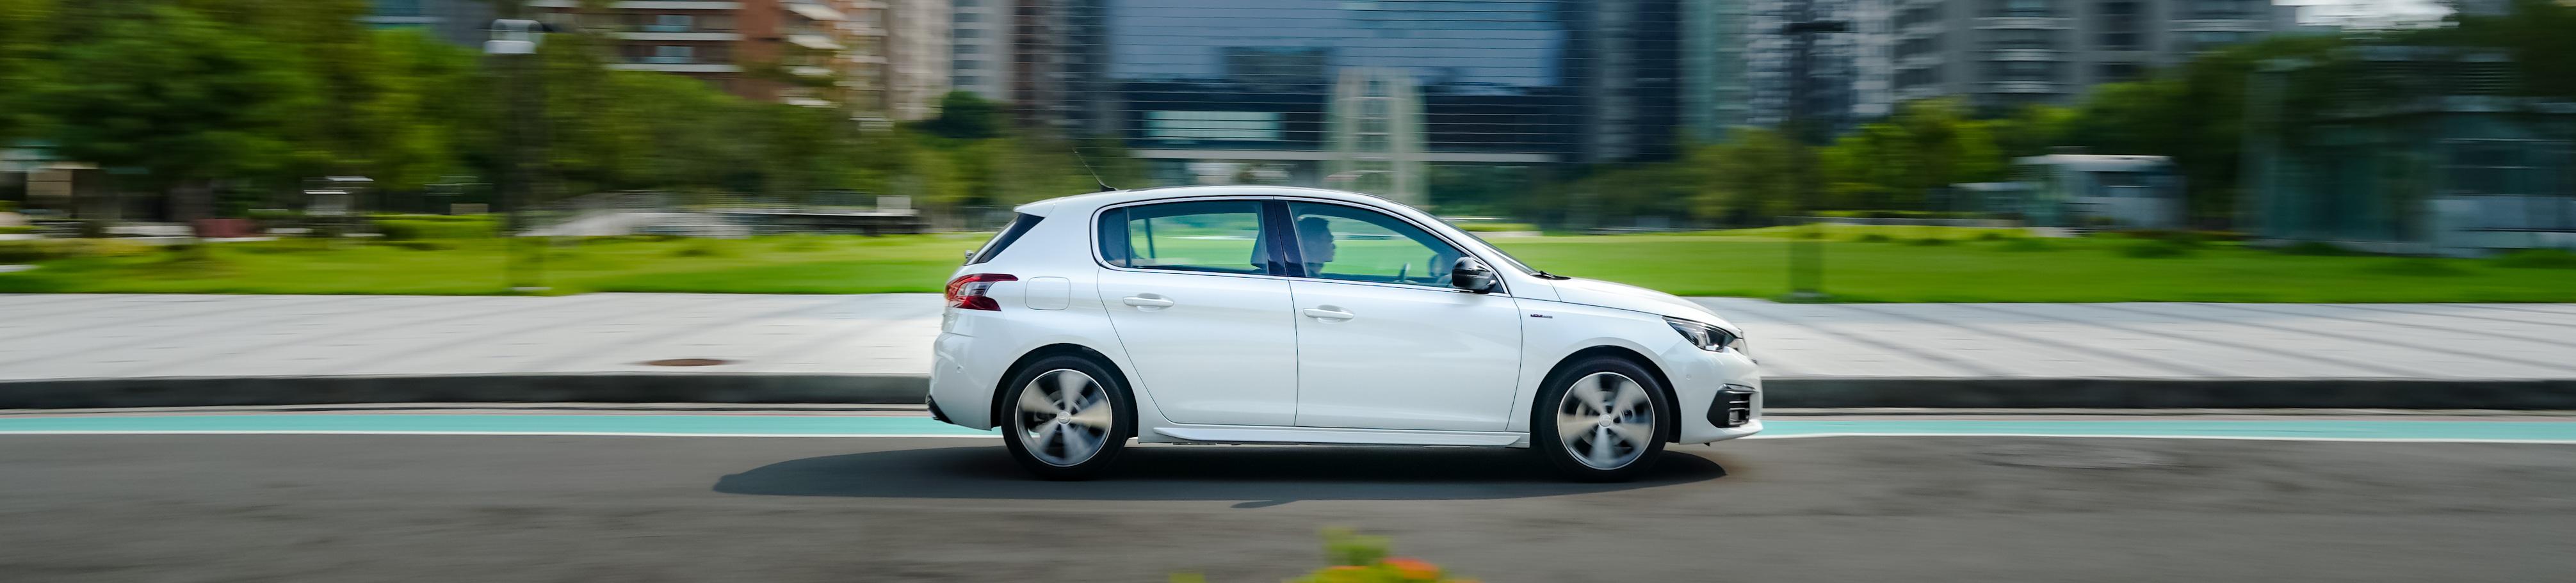 Peugeot 308 特仕版提供 Allure、Allure+、GT Line Cielo 三車型,售價分別為 118.9 萬、122.9 萬、138.9 萬元。